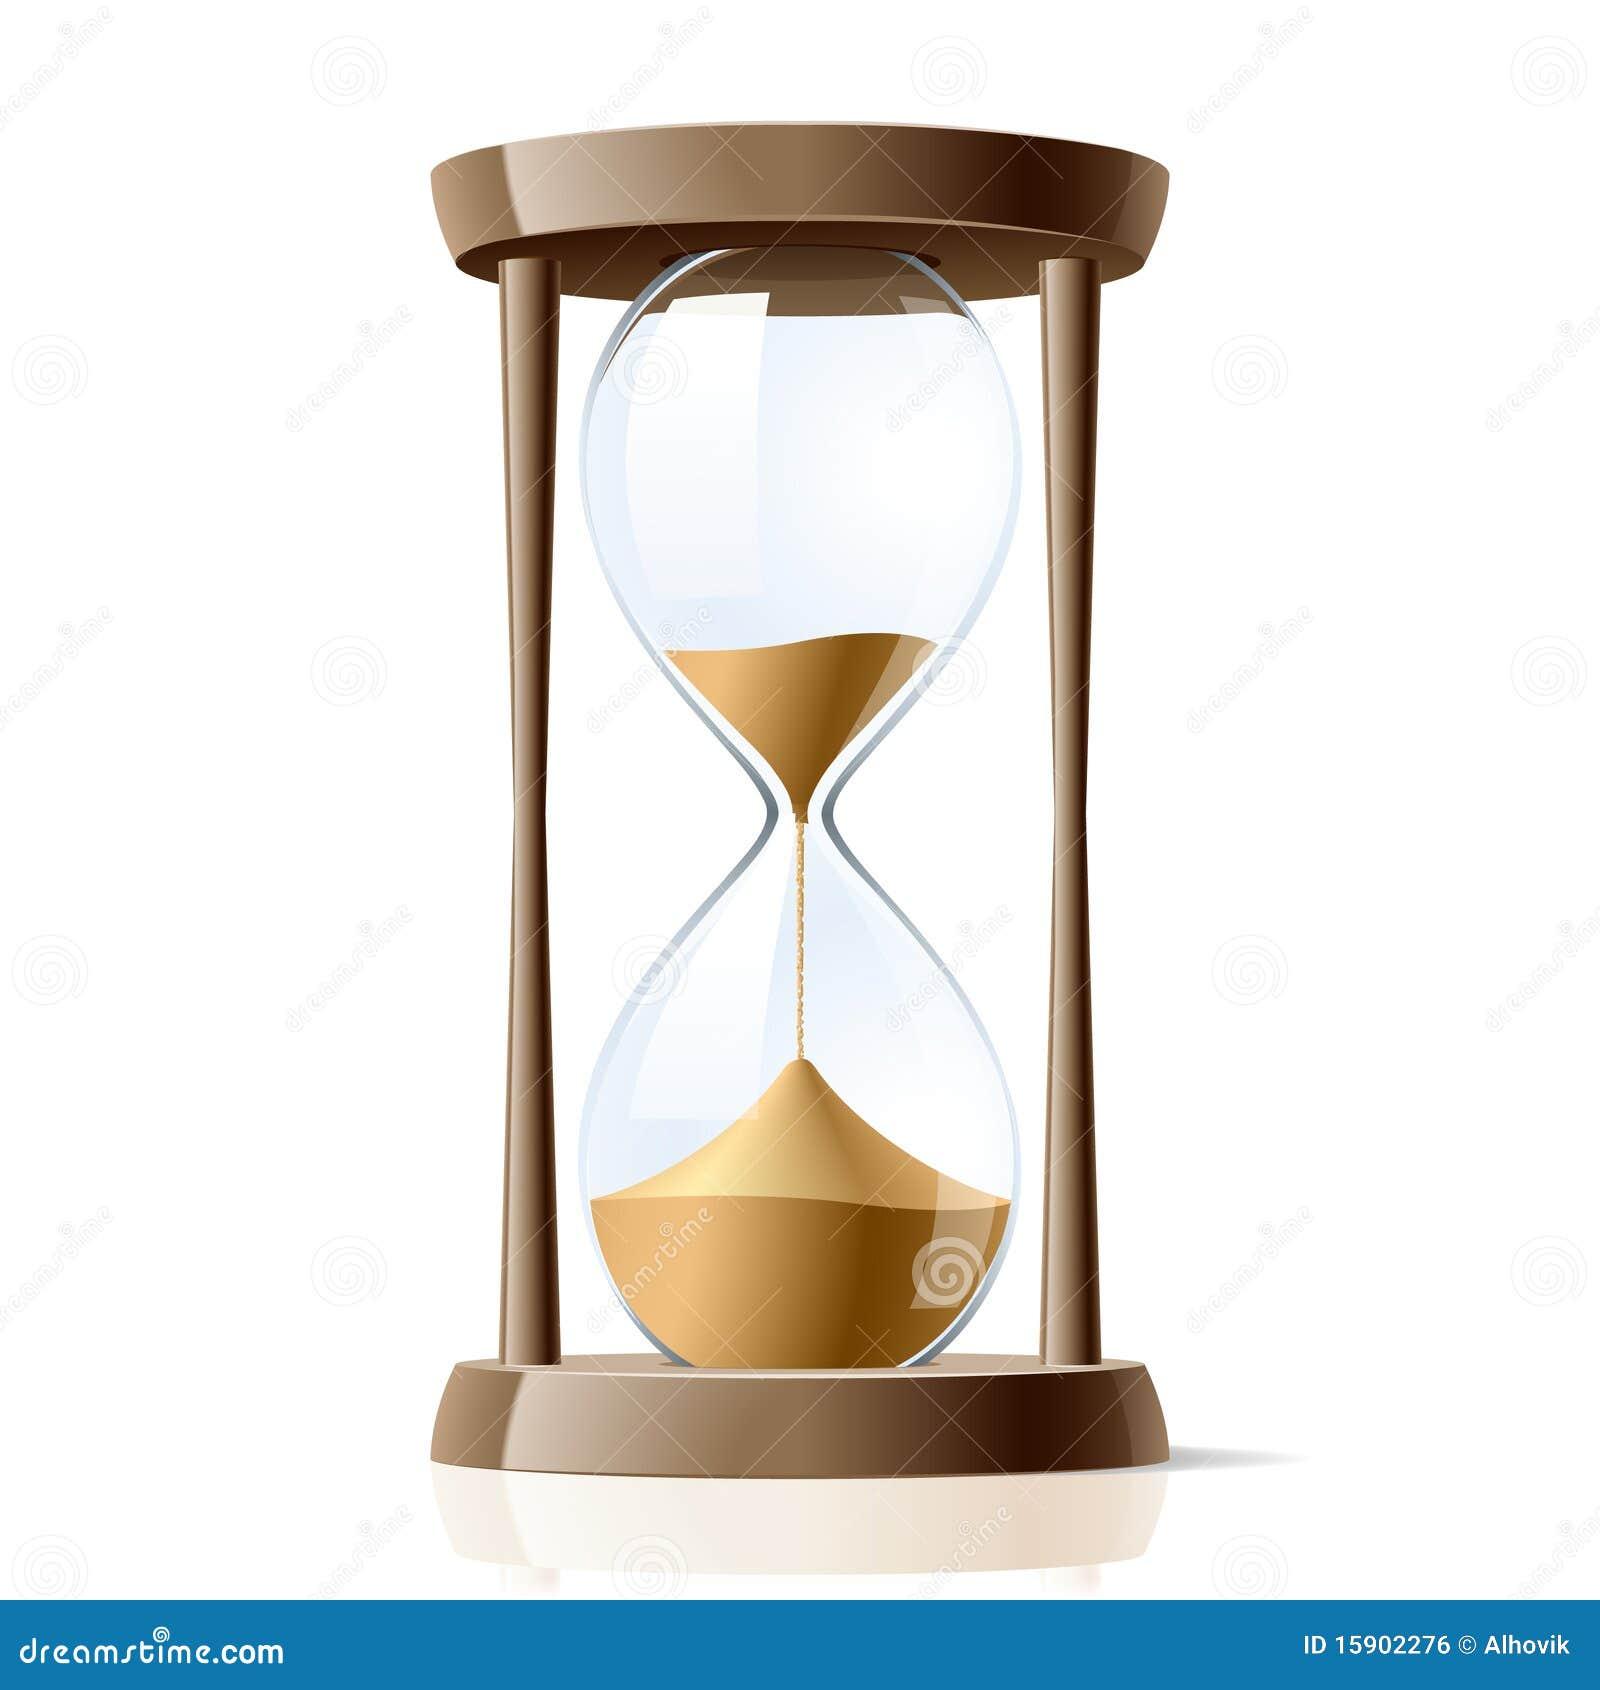 Reloj de arena imagen de archivo libre de regal as for Fotos de reloj de arena